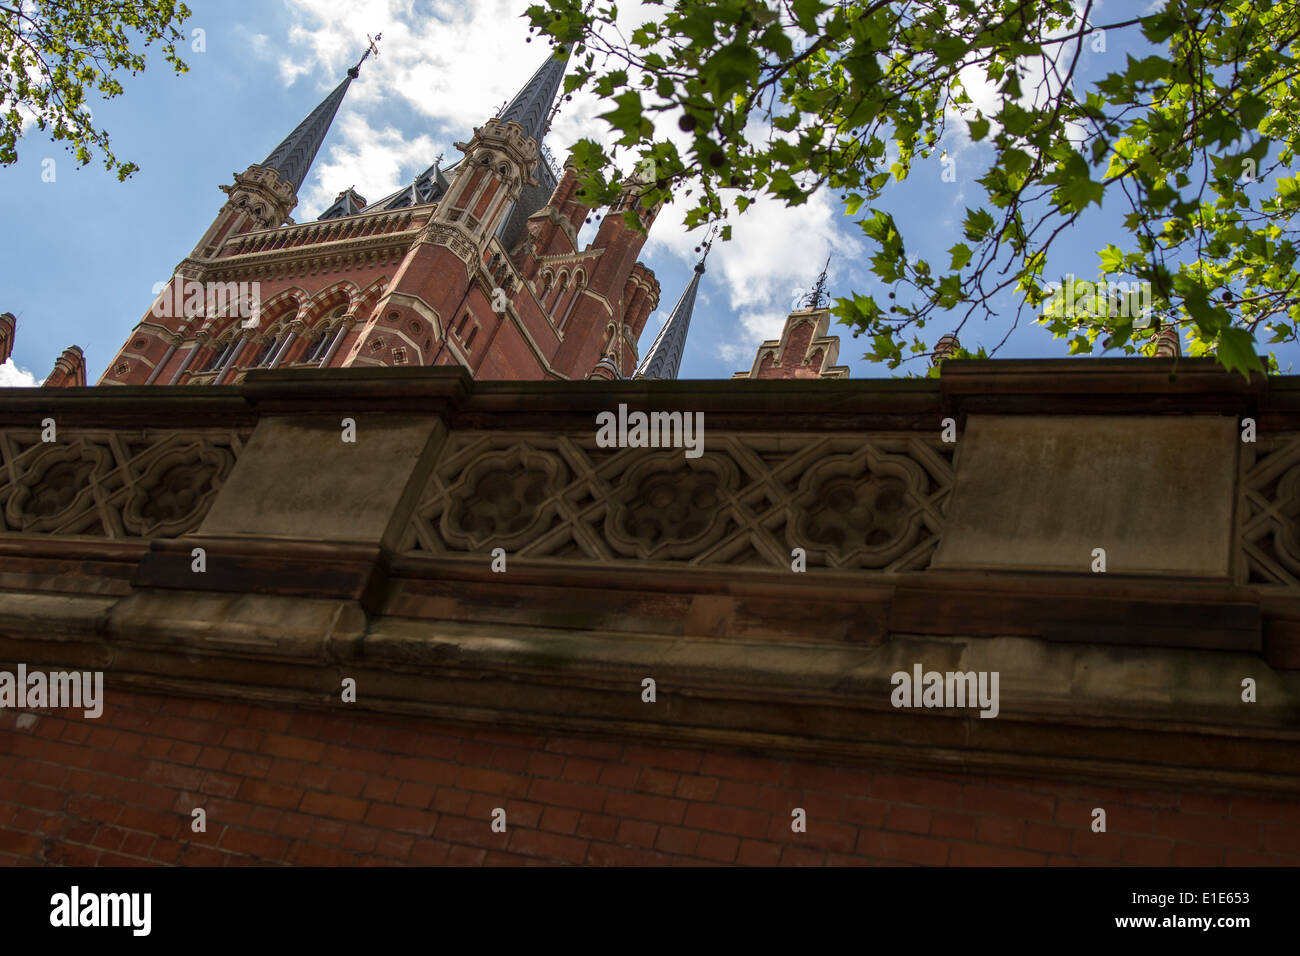 St Pancras railway station - Stock Image